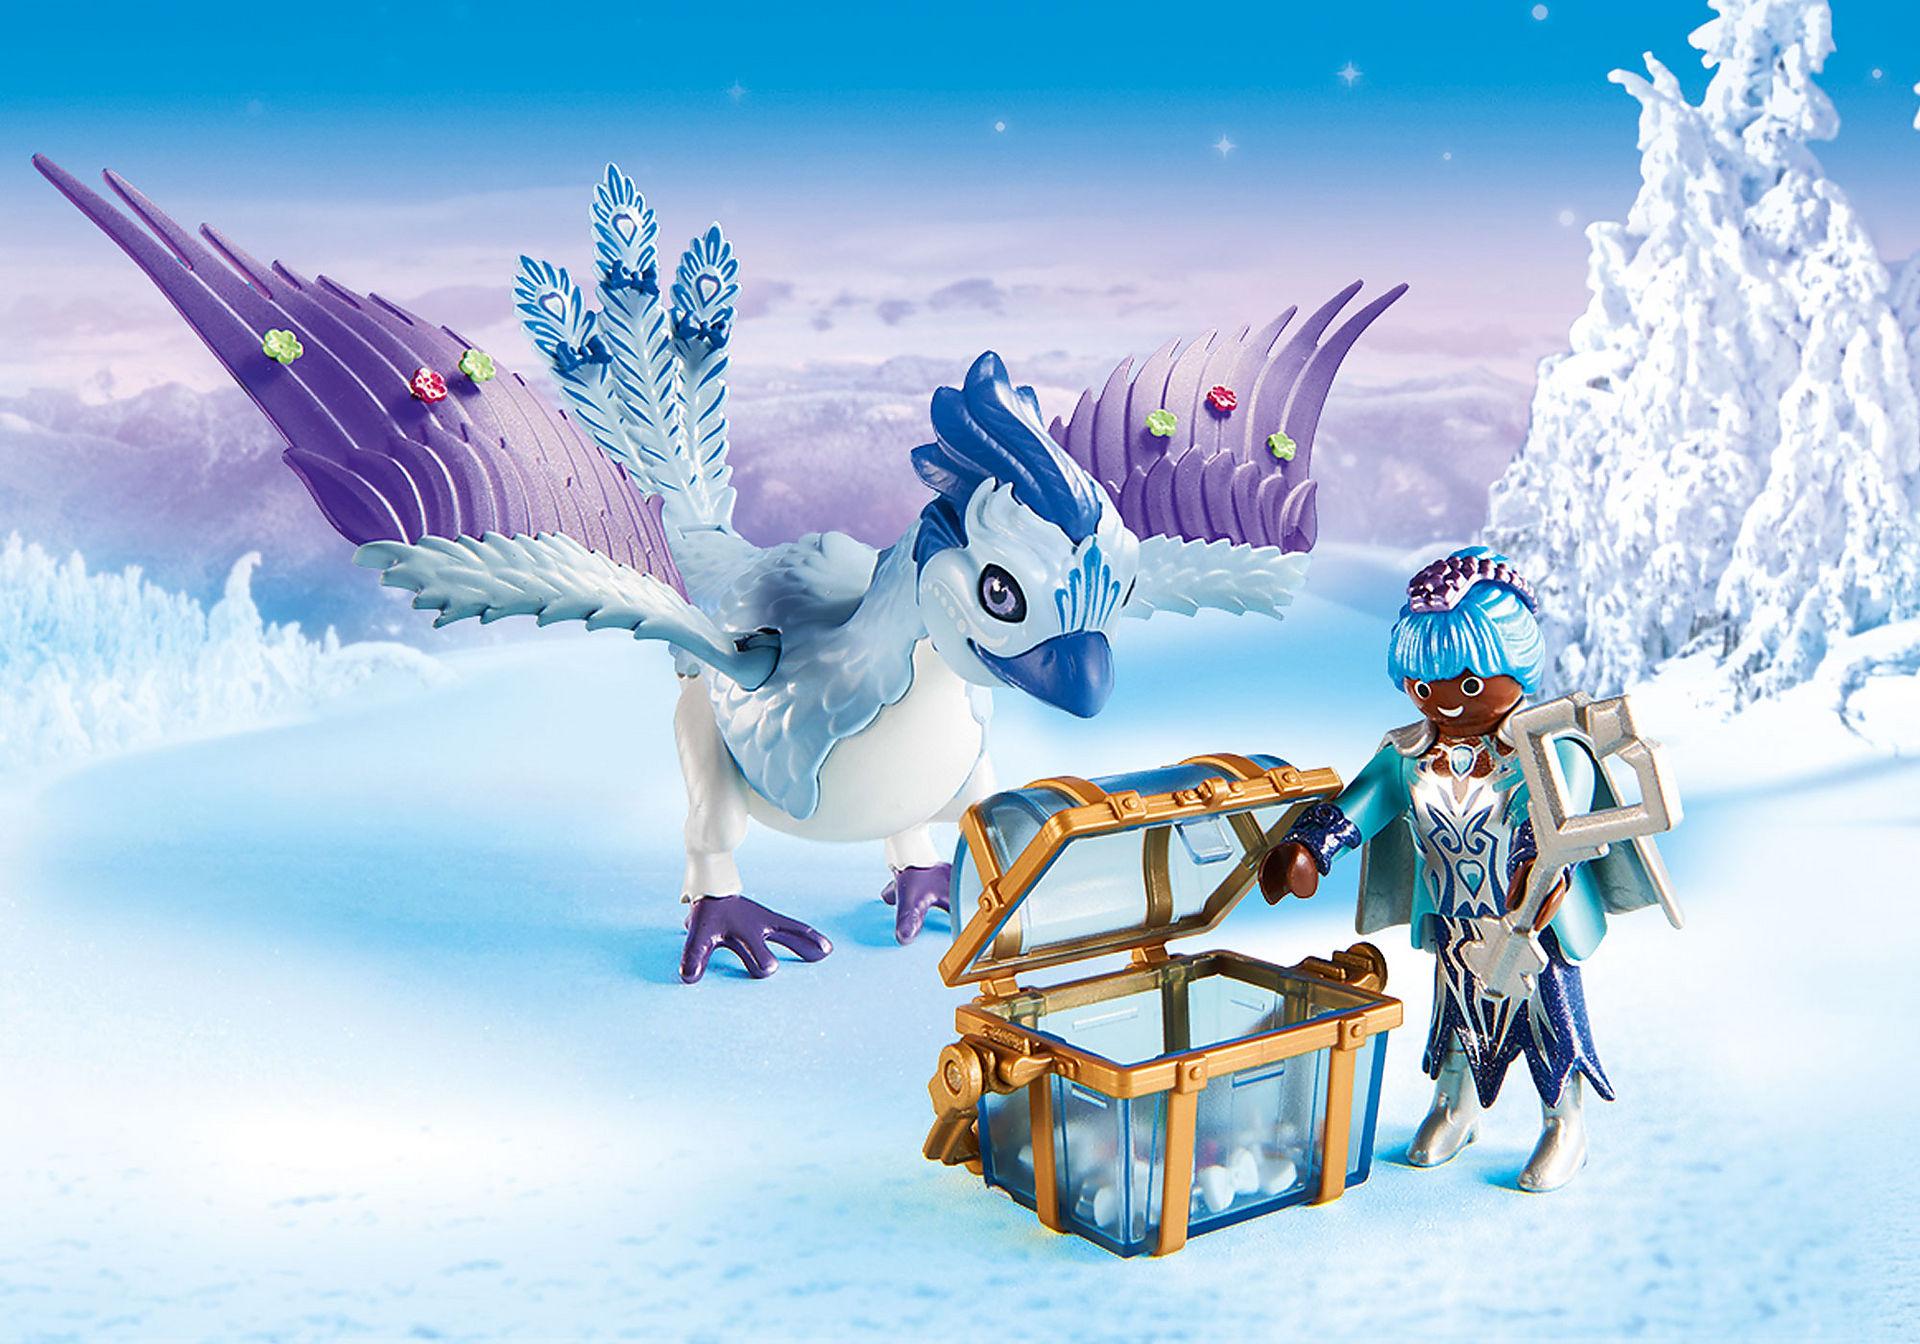 http://media.playmobil.com/i/playmobil/9472_product_extra1/Winter Phoenix